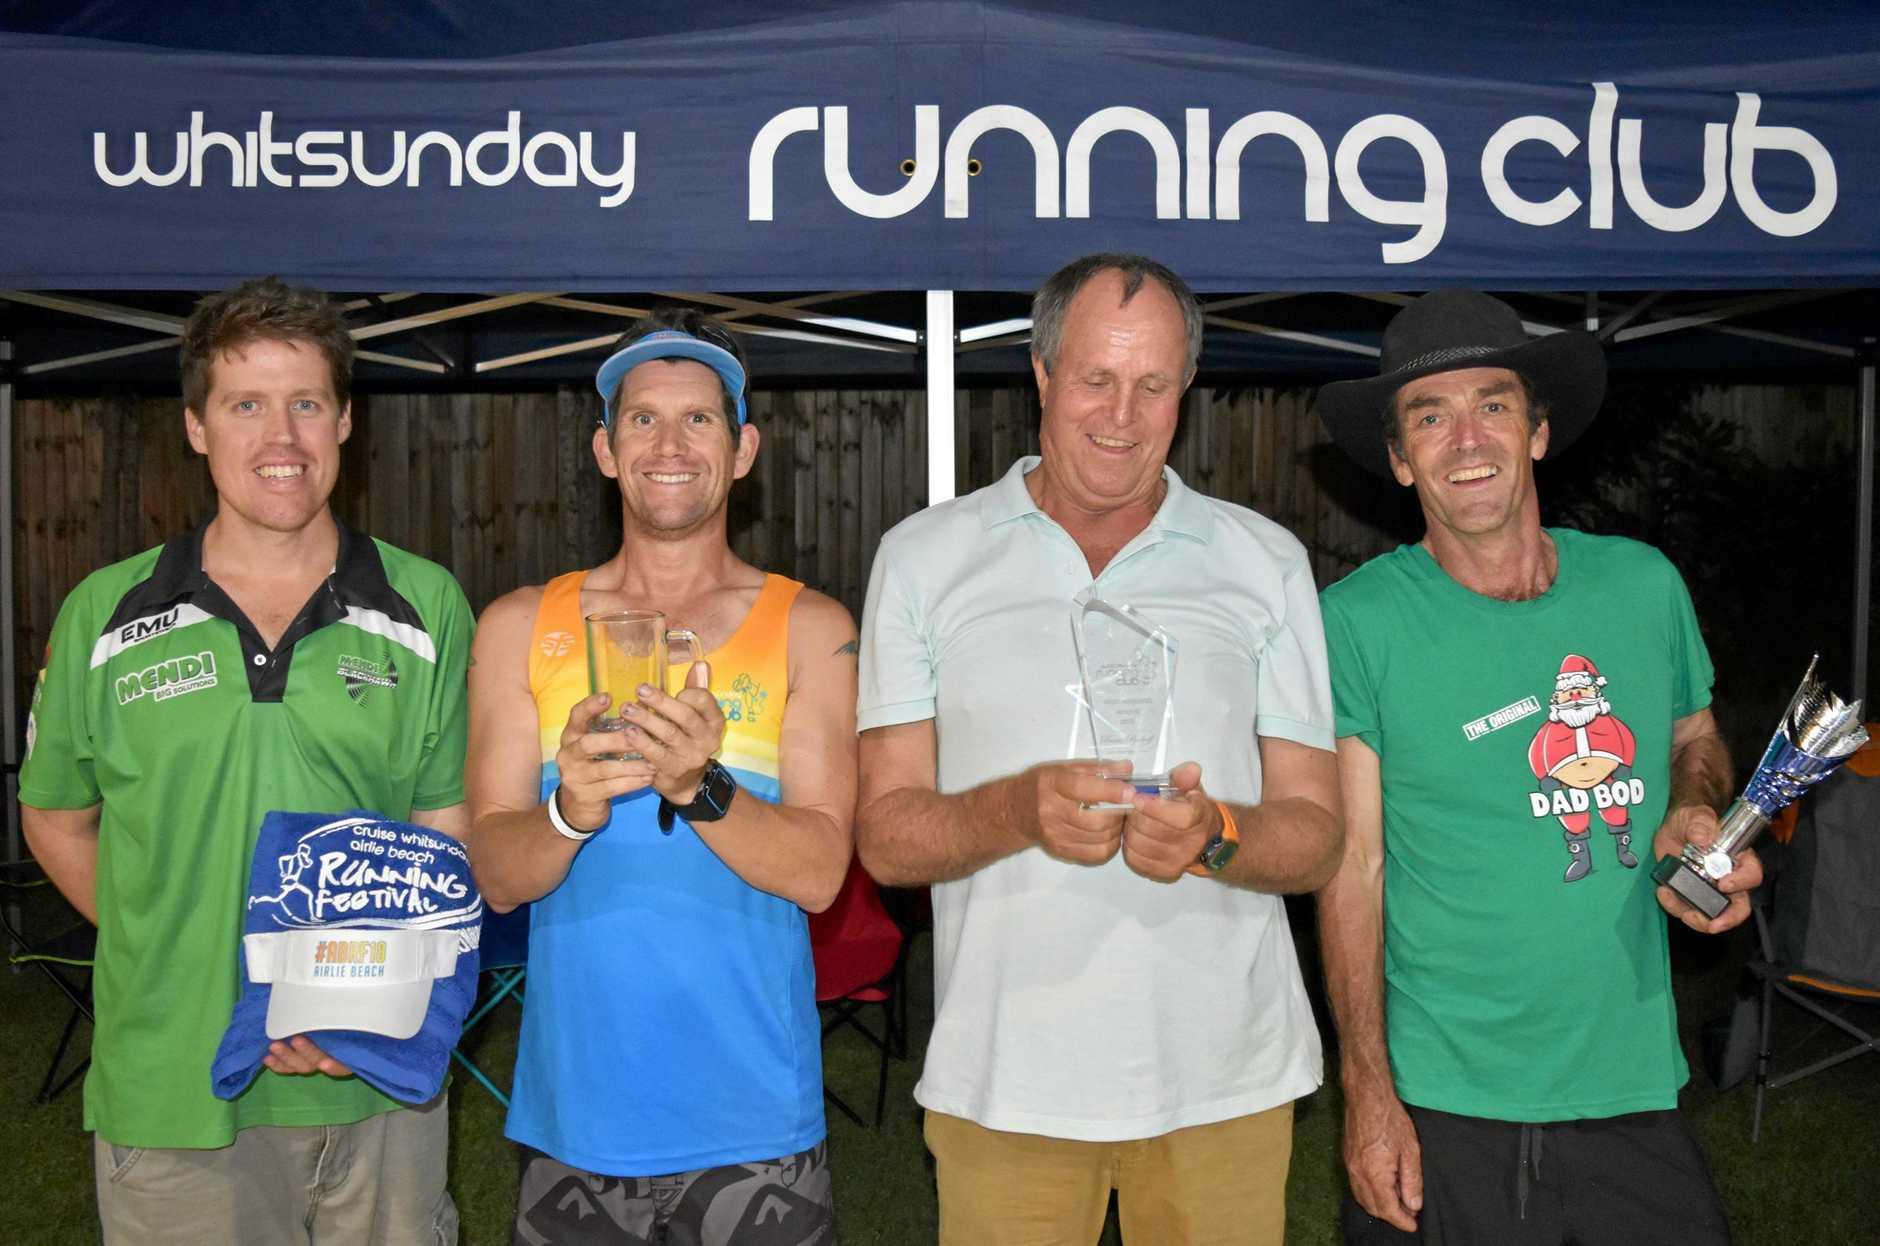 Whitsunday Running Club male award recipients Chris Harvey, Justin Knight-Gray, Bossie Boshoff and Geoffrey Fyvie.